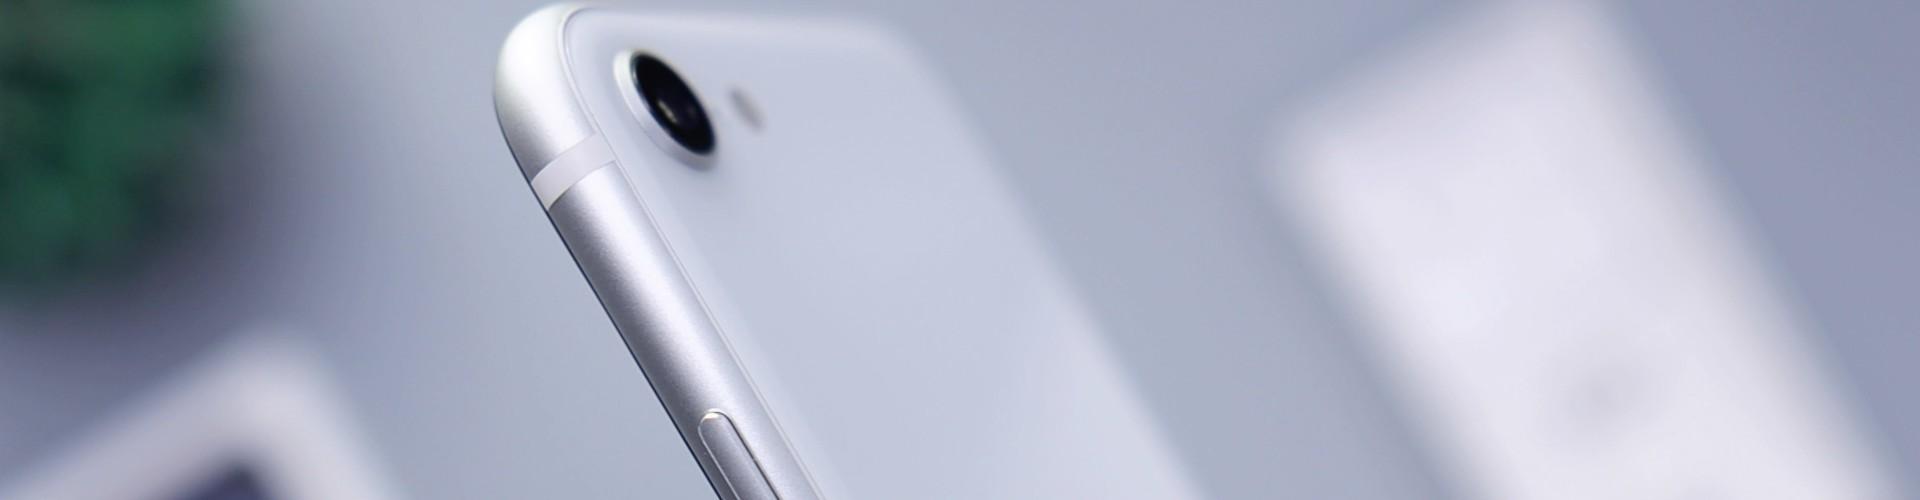 iphone se achtergrond